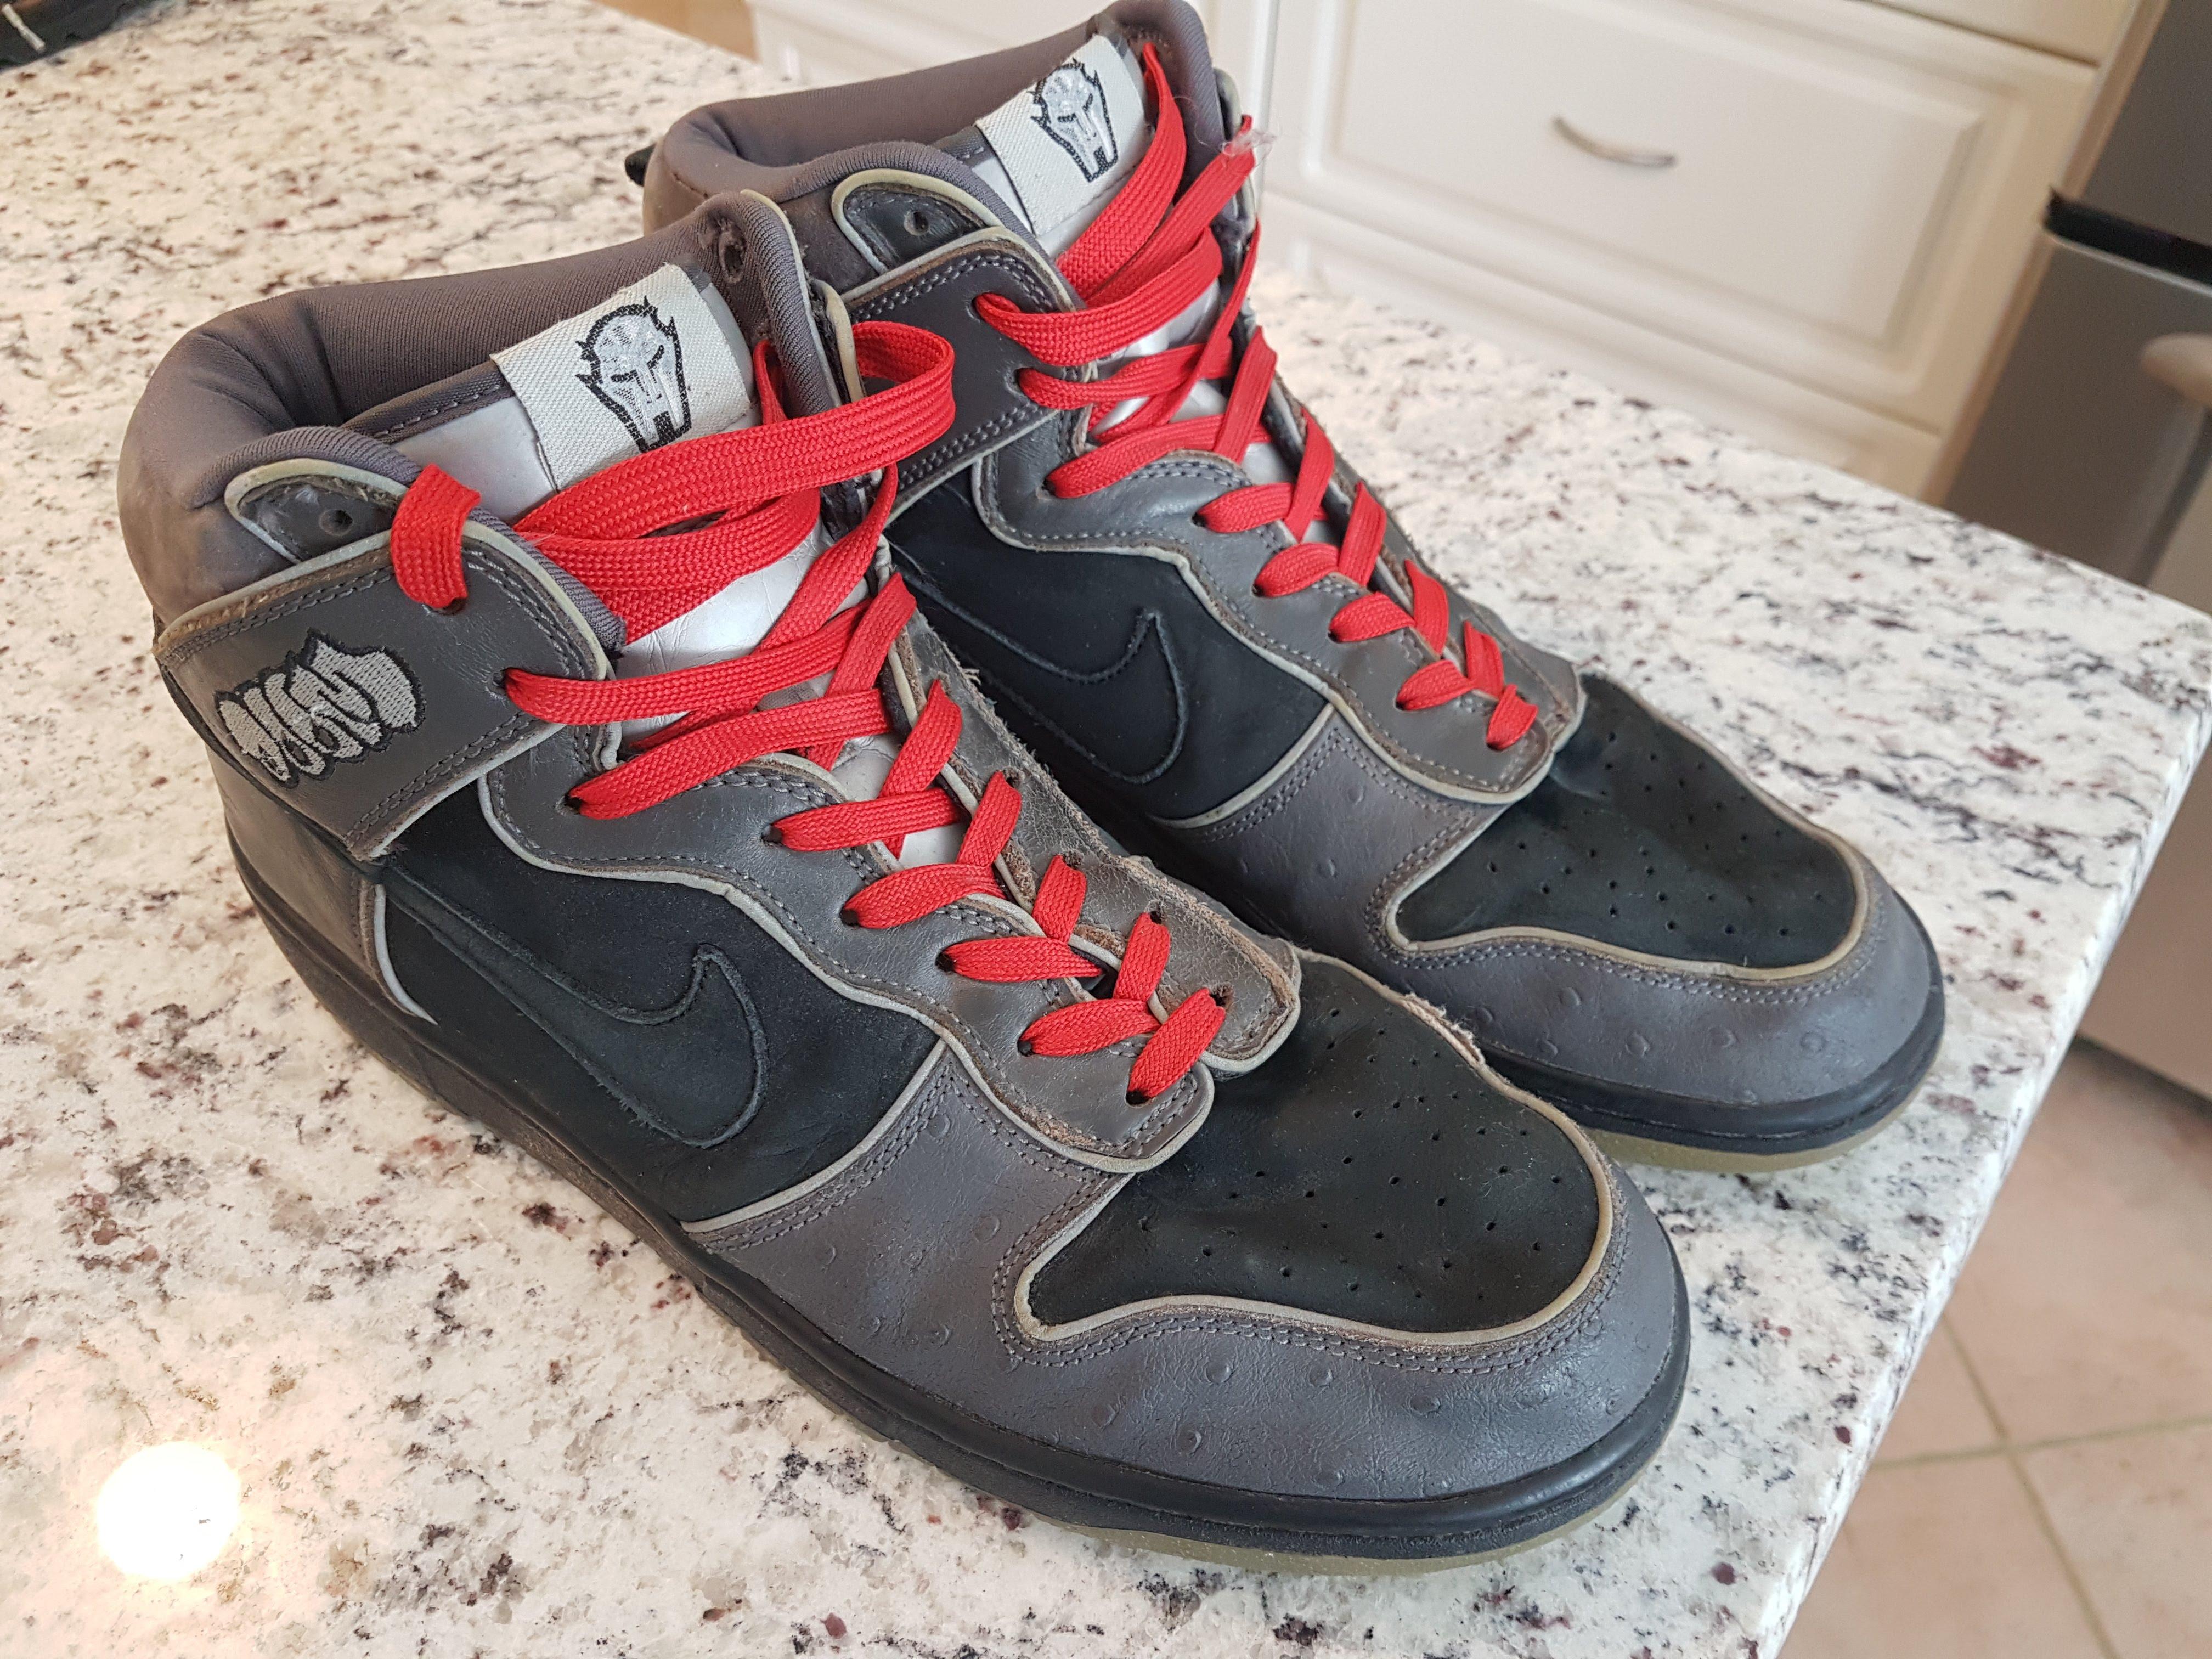 official photos f25f9 e6bff Nike SB Dunk High MF Doom